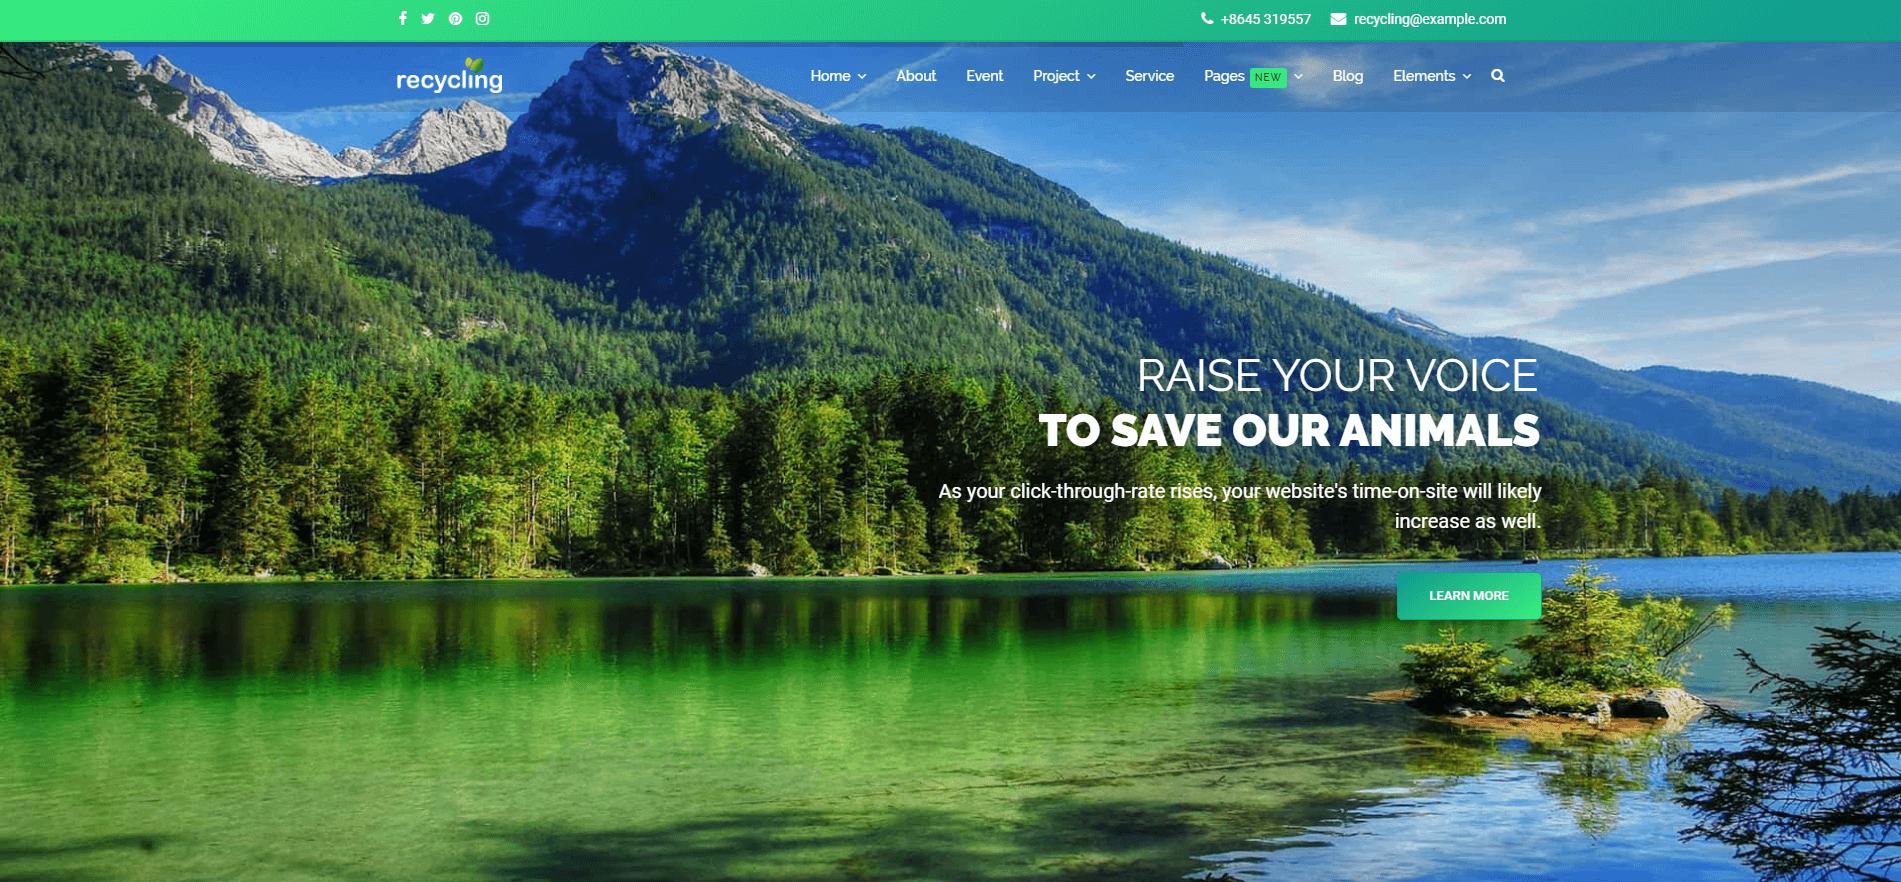 Recycling - Nonprofit / Environmental Joomla Template